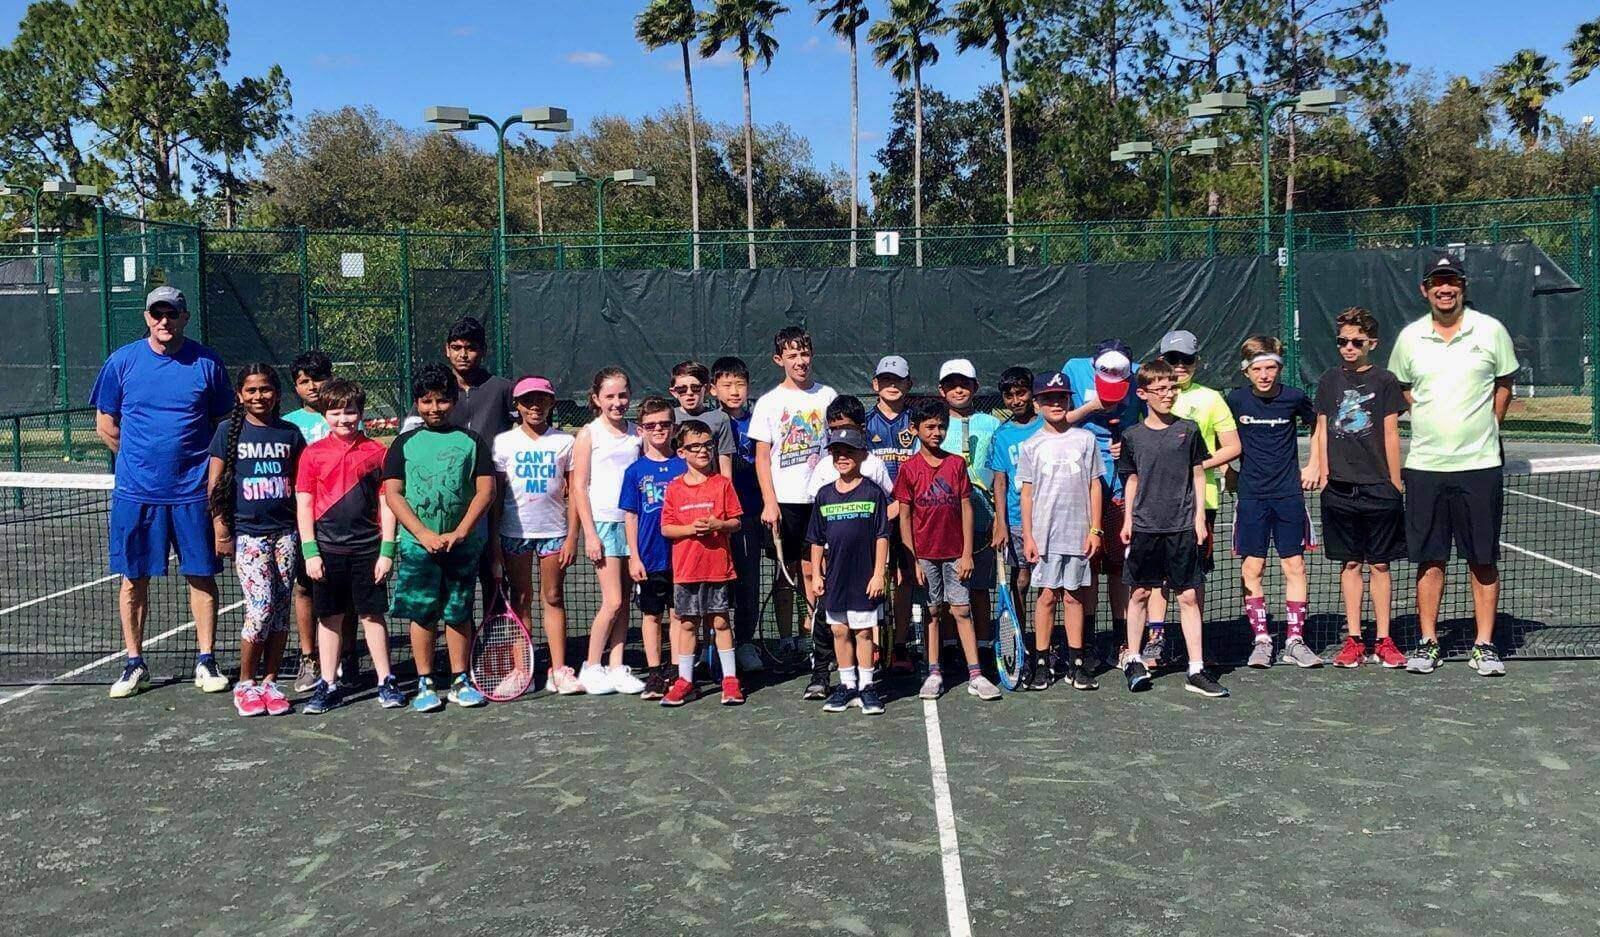 Traveling Tennis Pros - Arbor Greene Group Photo